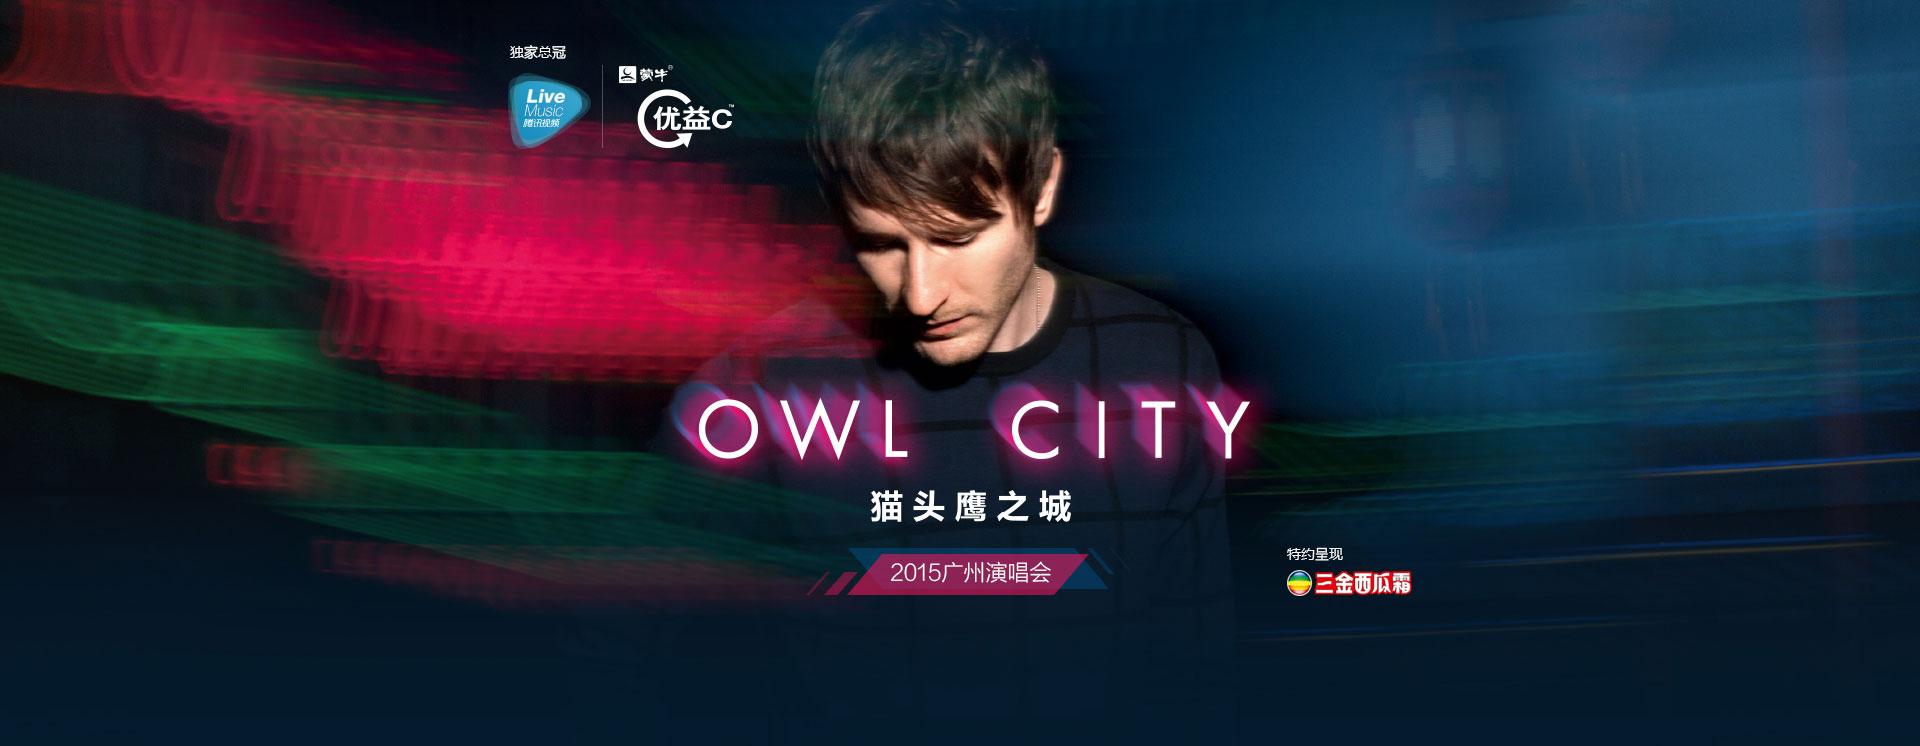 Owl City2015广州演唱会现场+采访视频!